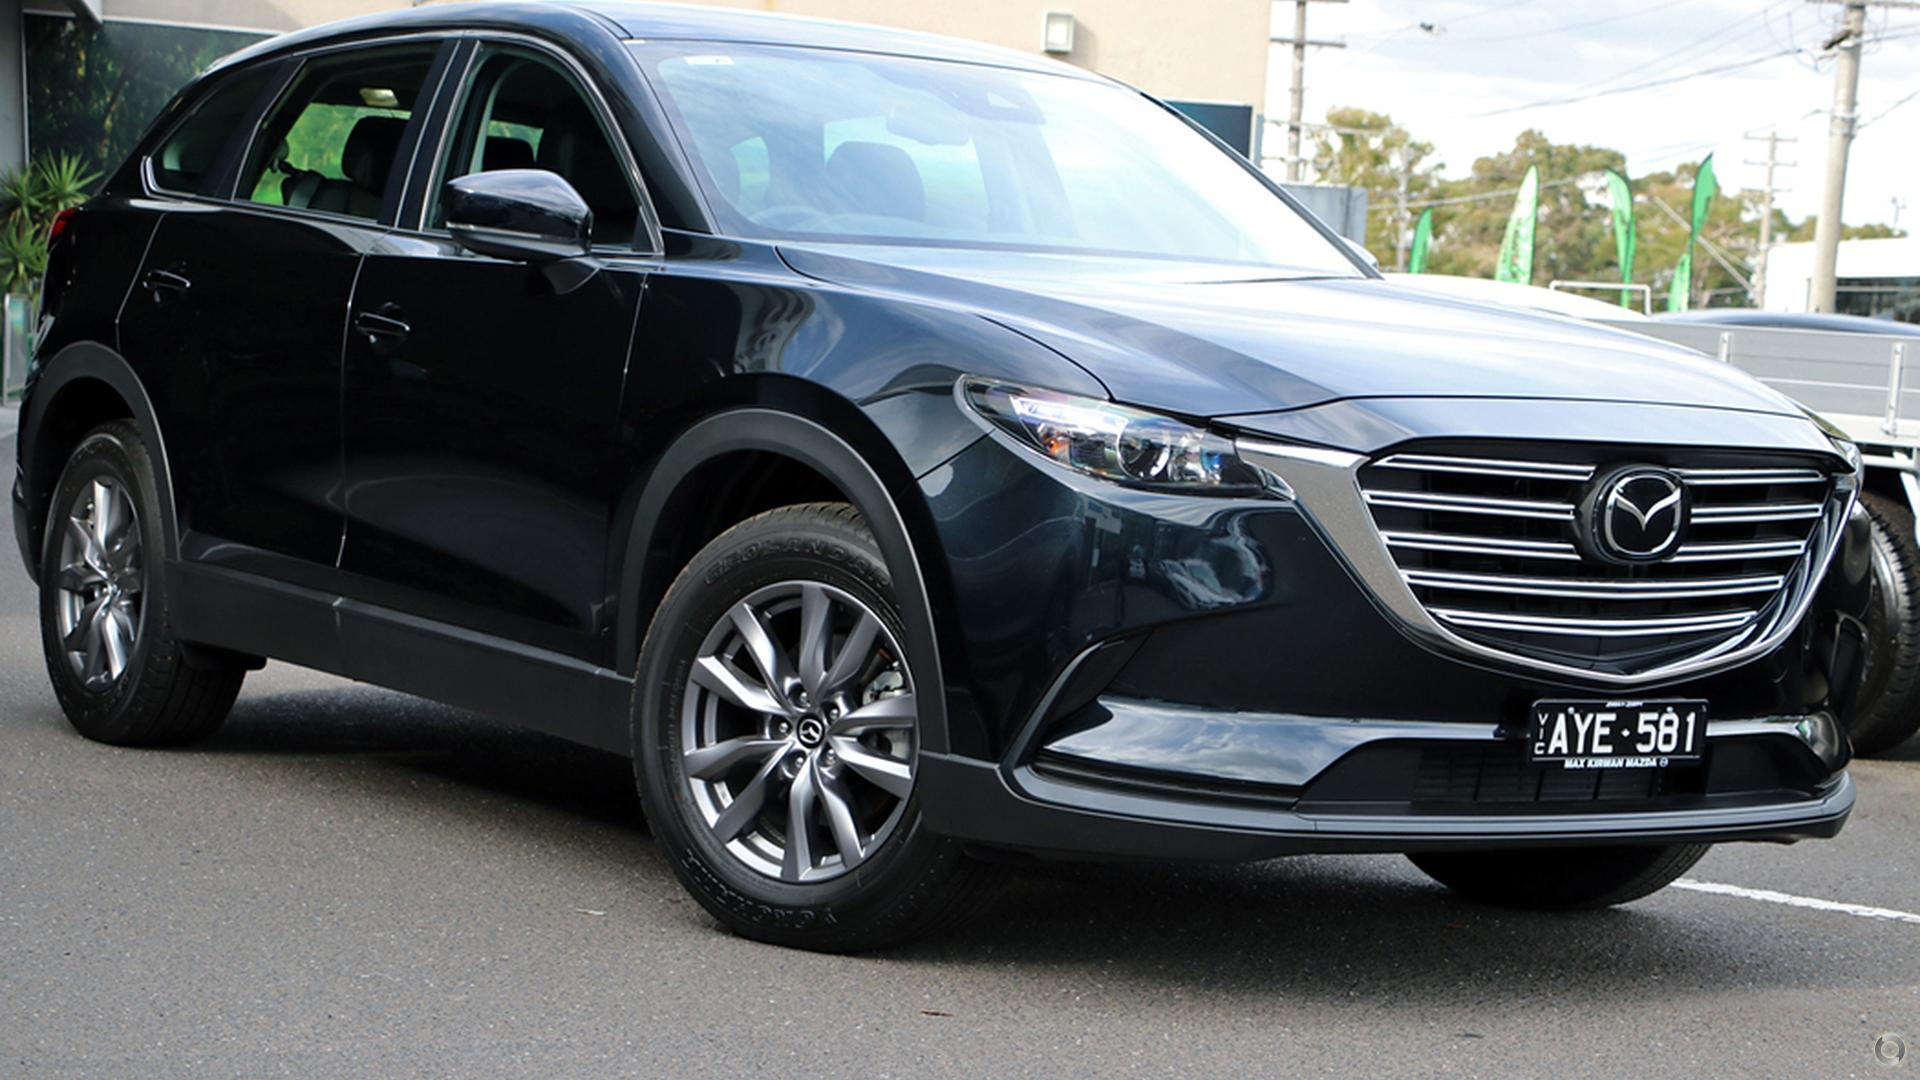 2018 Mazda Cx-9 TC